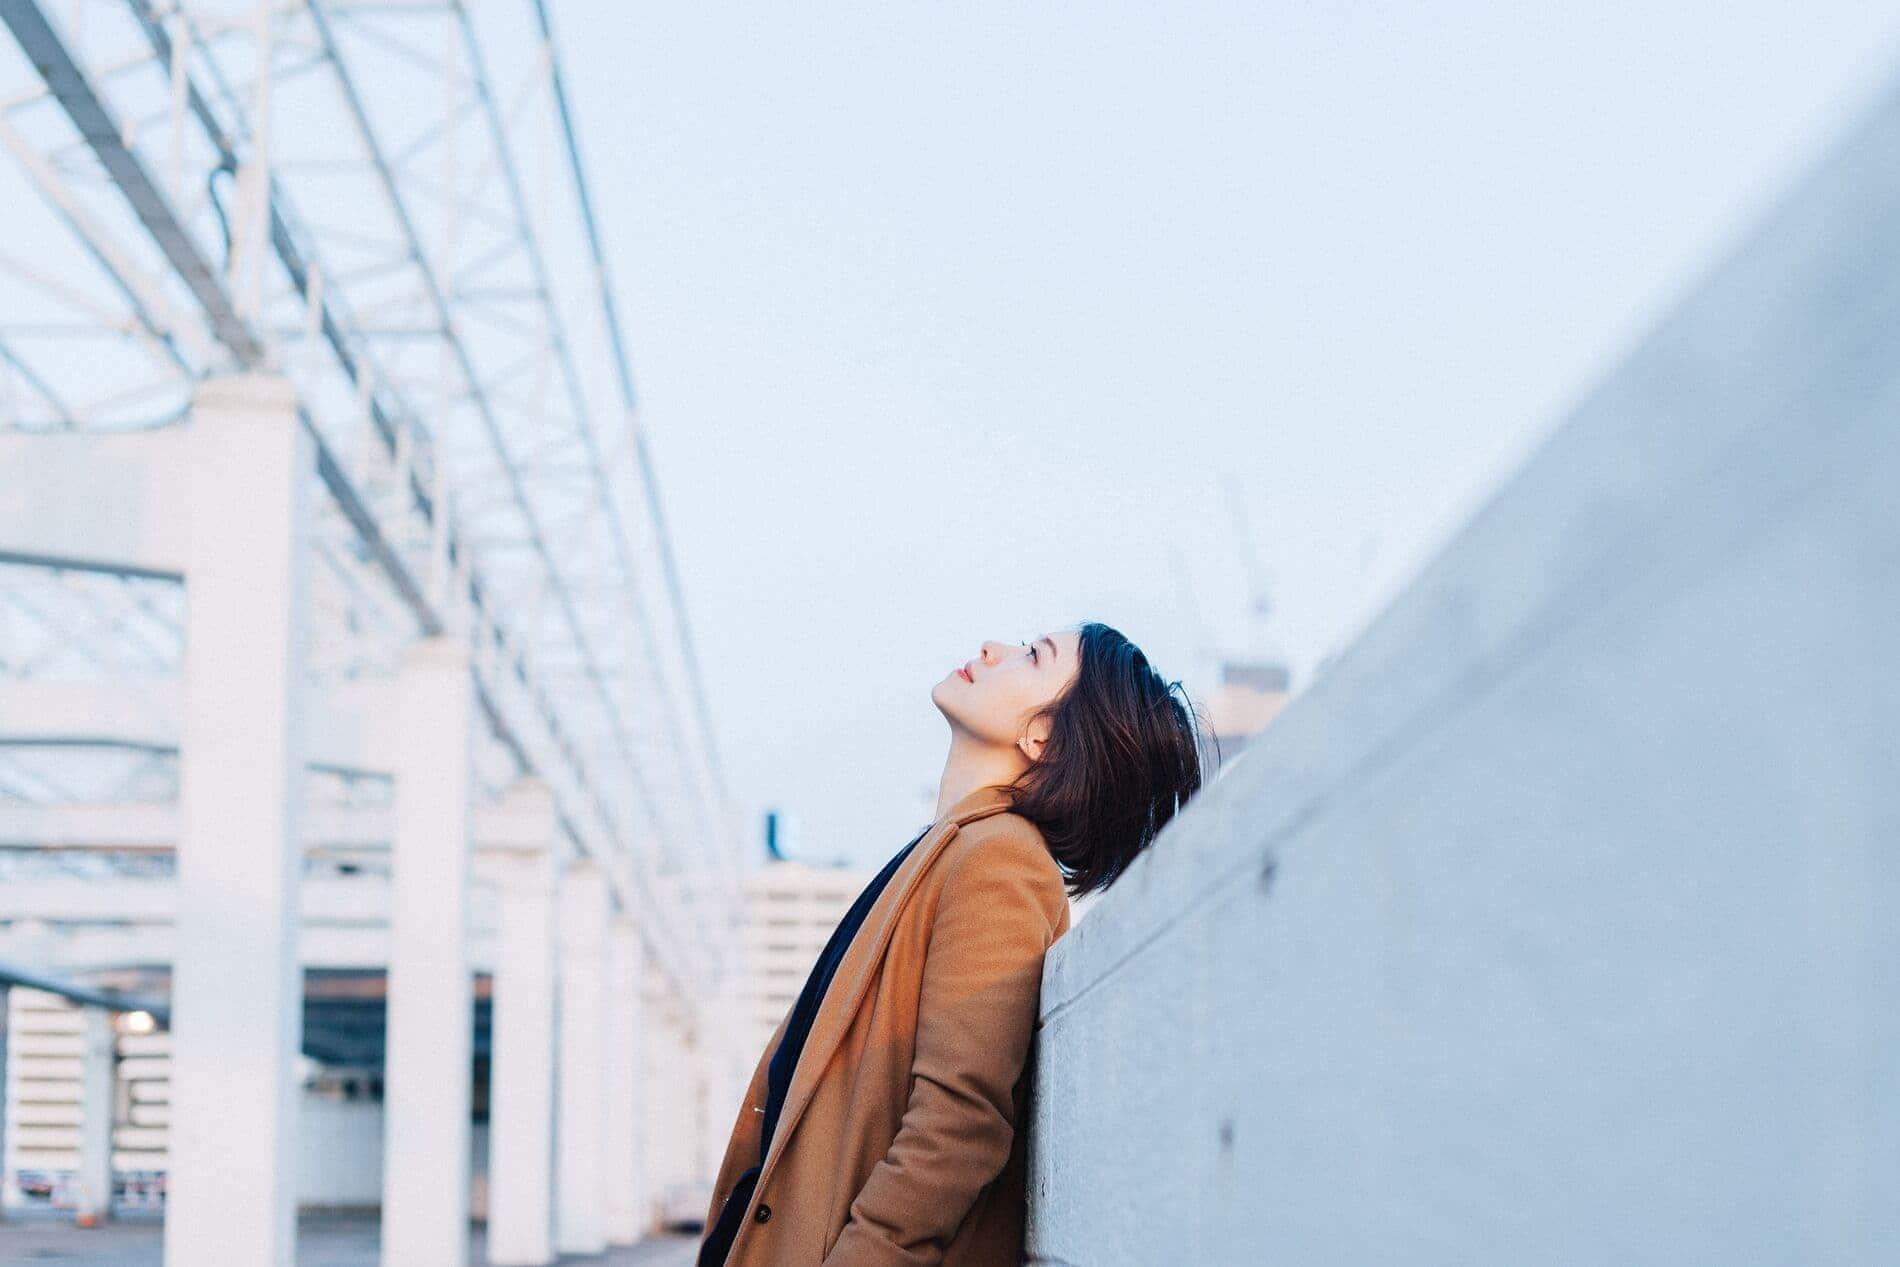 Mujer mirando hacia arriba